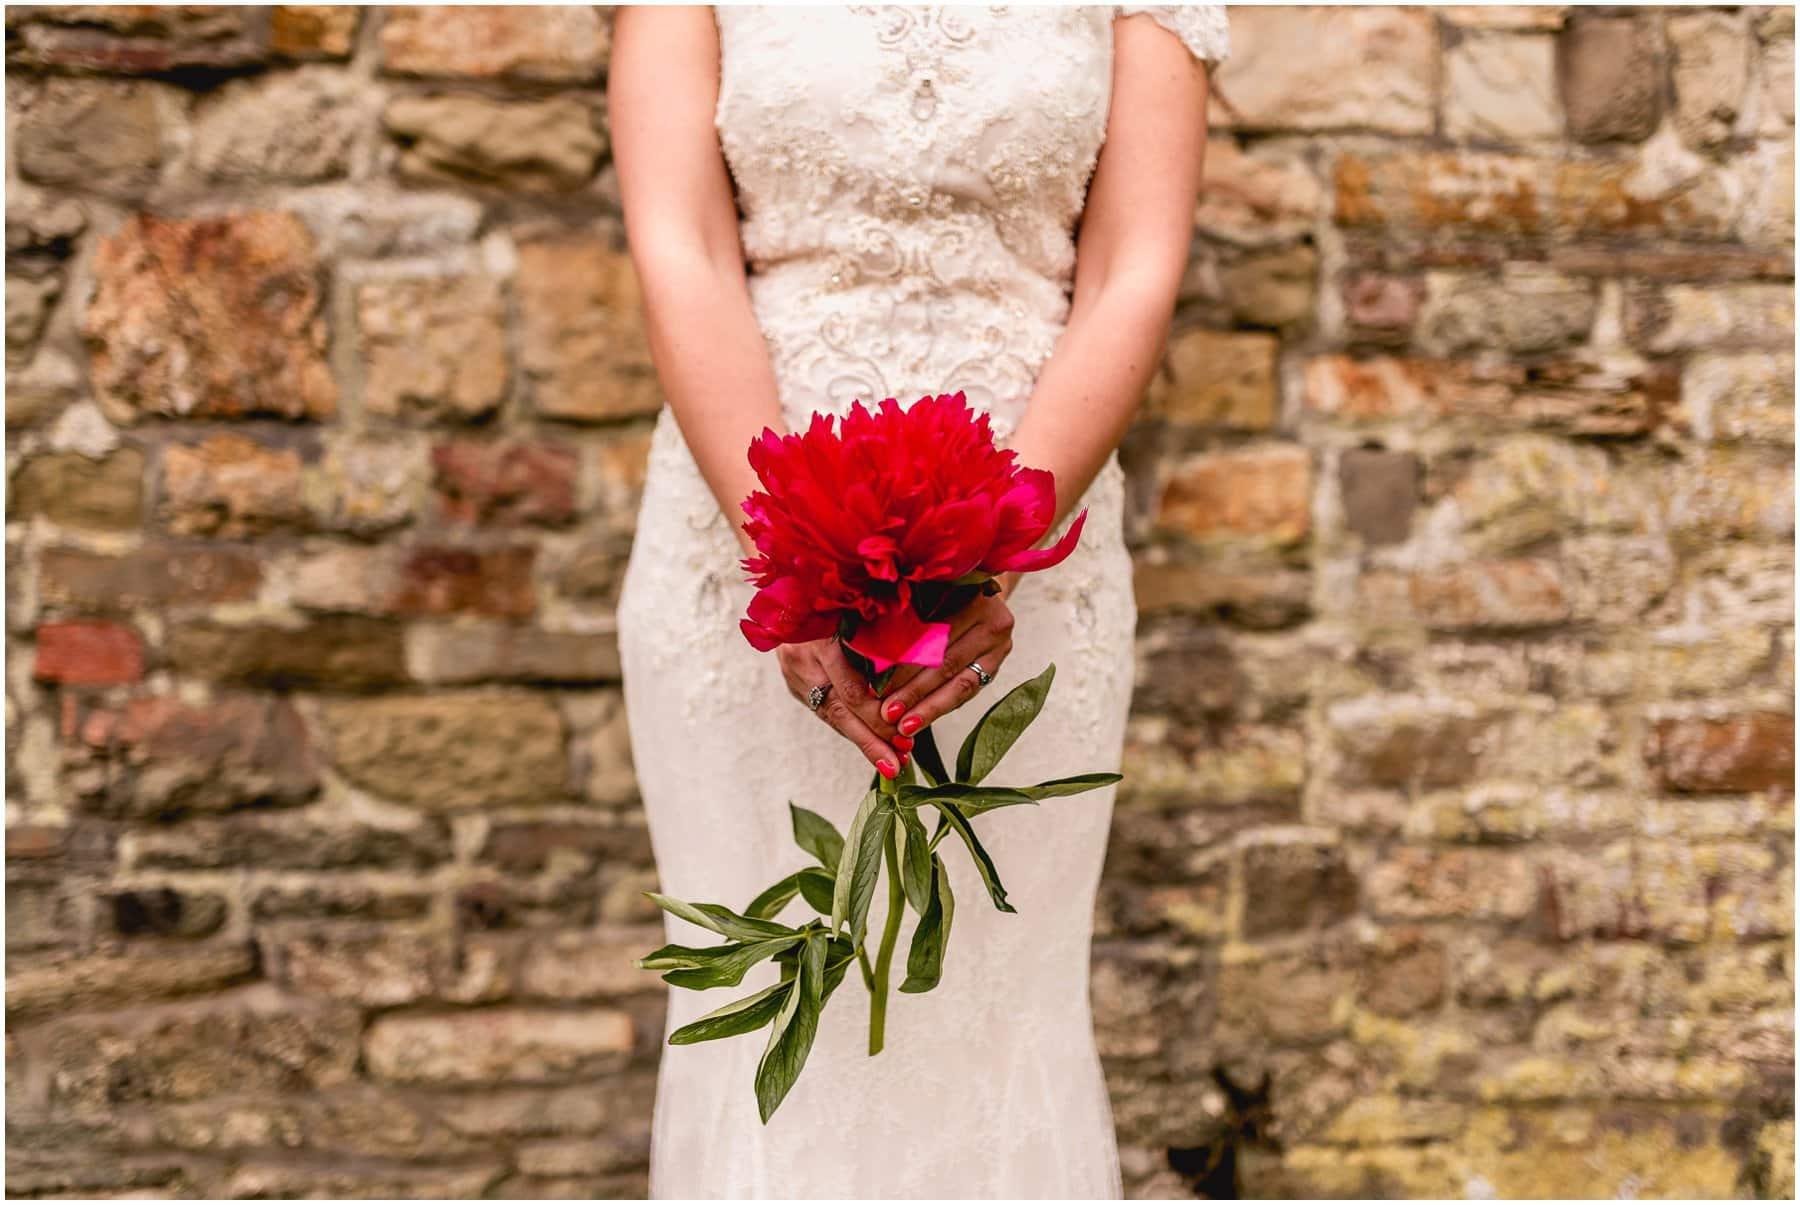 Bridal bouquet single stem large red flower.